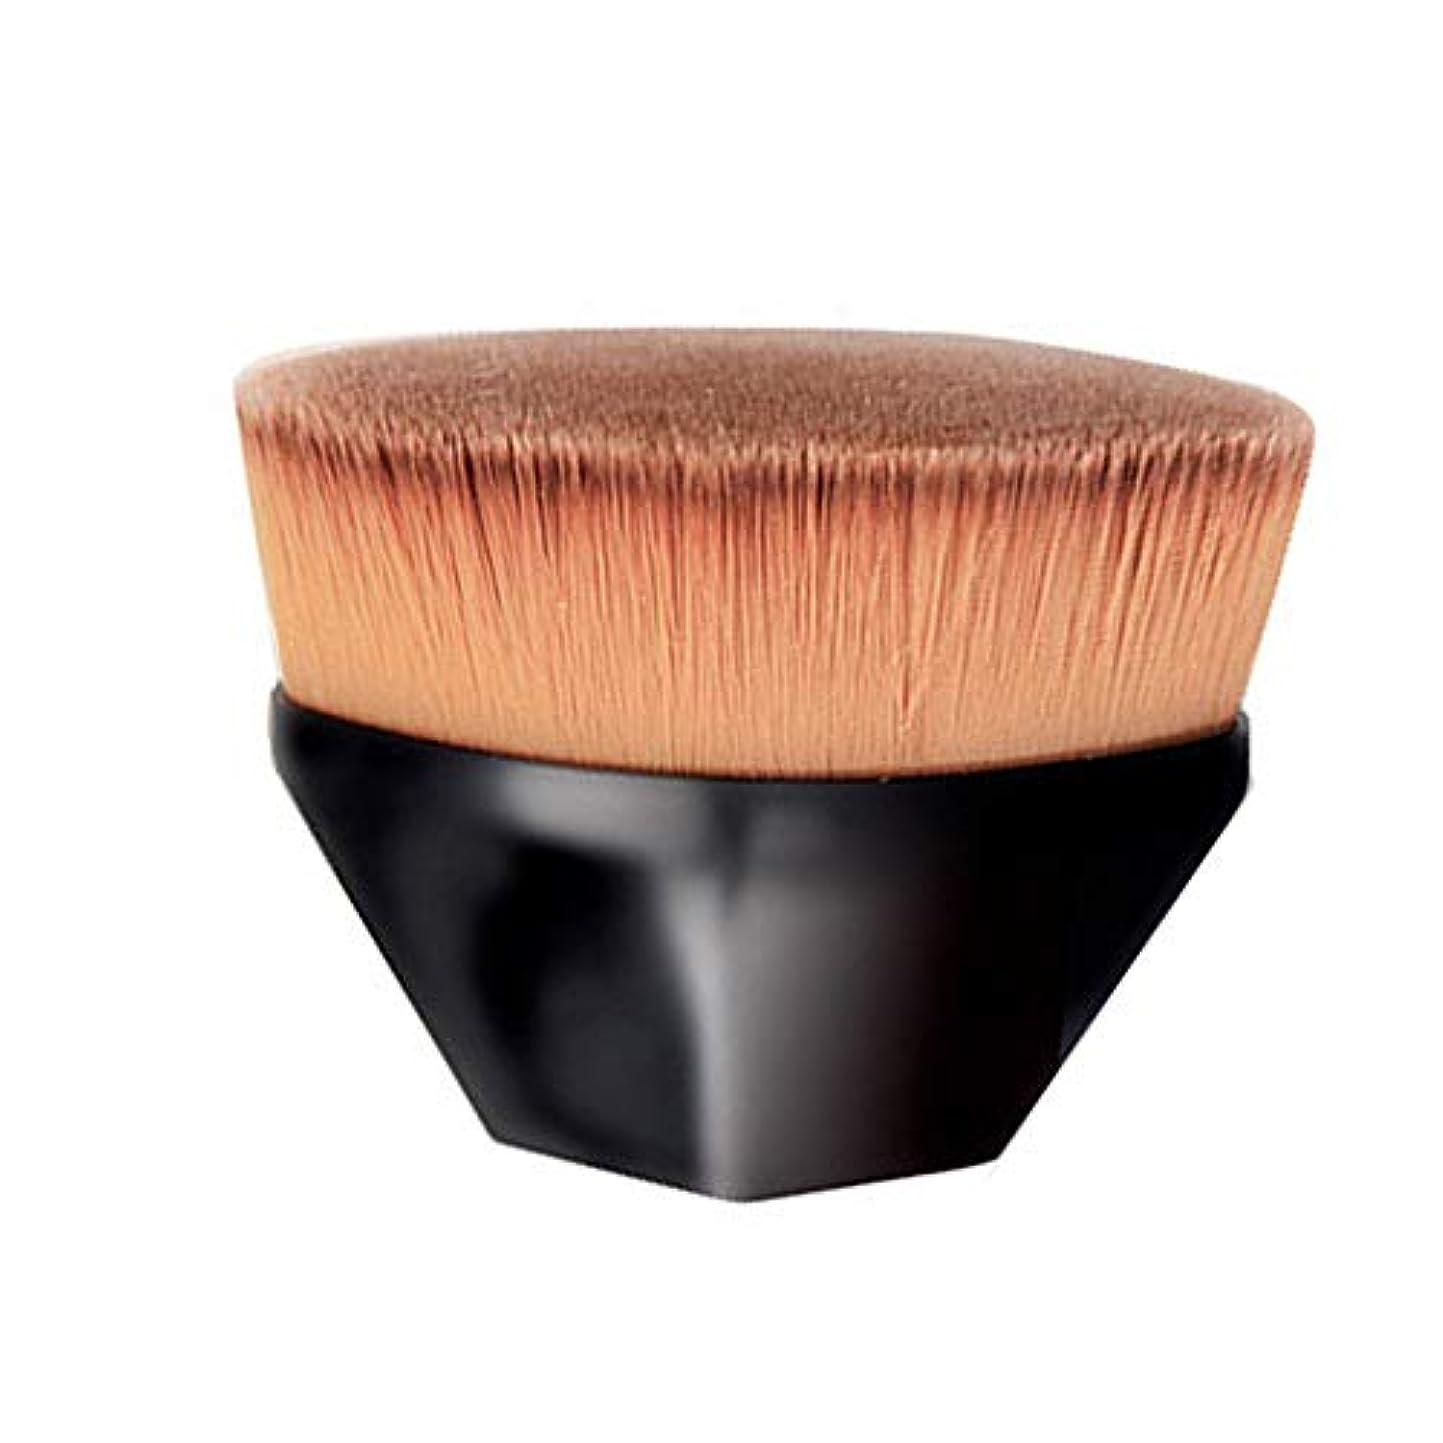 YuJiny メイクアップブラシ 粧ブラシ 可愛い 化粧筆 肌に優しい ファンデーションブラシ アイシャドウブラシ 携帯便利 (ブラック)